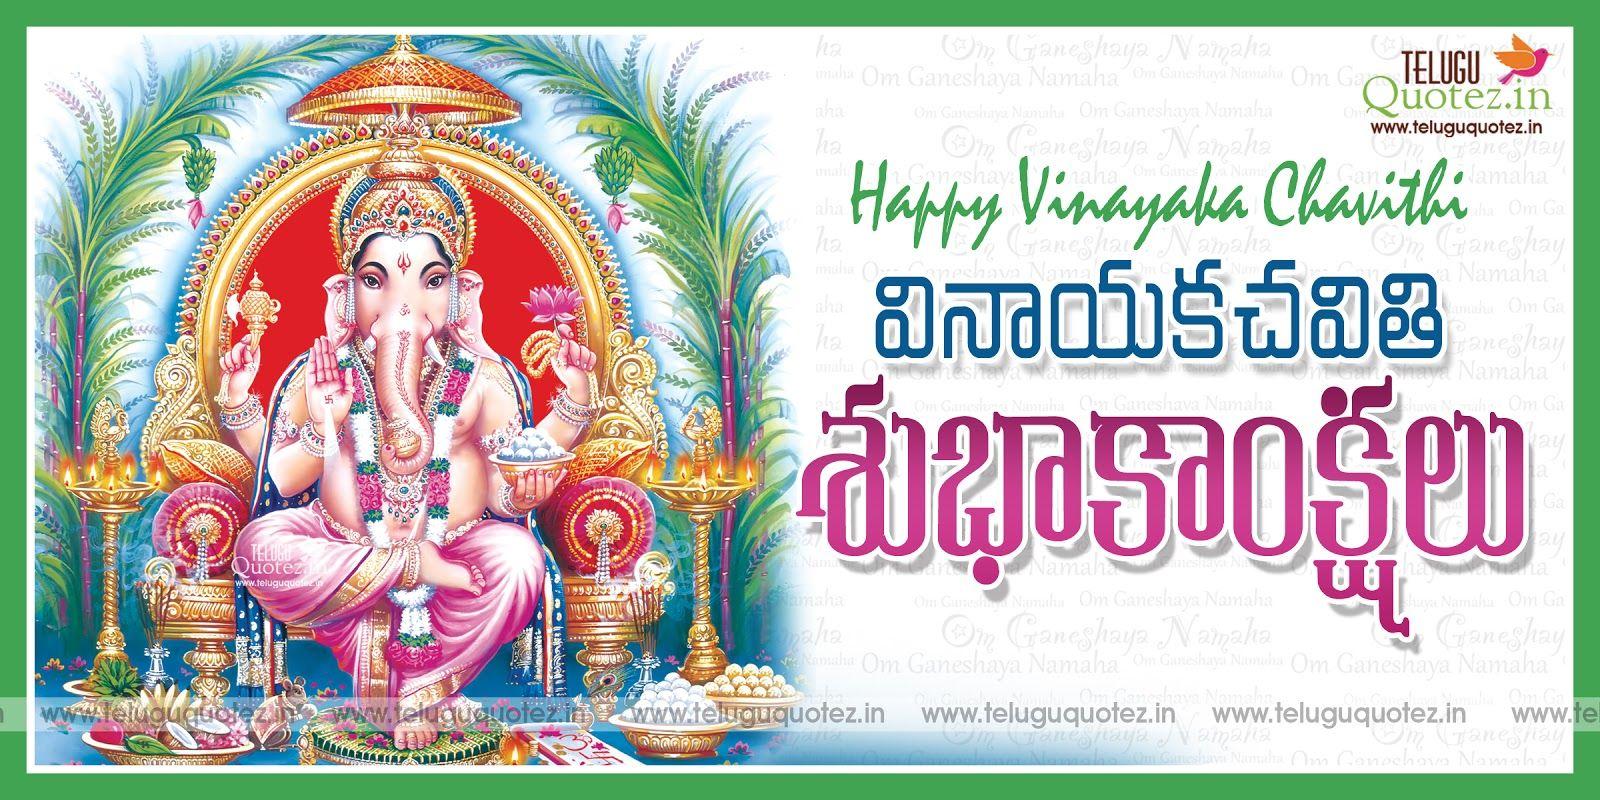 Baby products vinayaka chavithi greetings stuff to buy vinayaka chavithi telugu images wishes hd wallpapers photos m4hsunfo Gallery